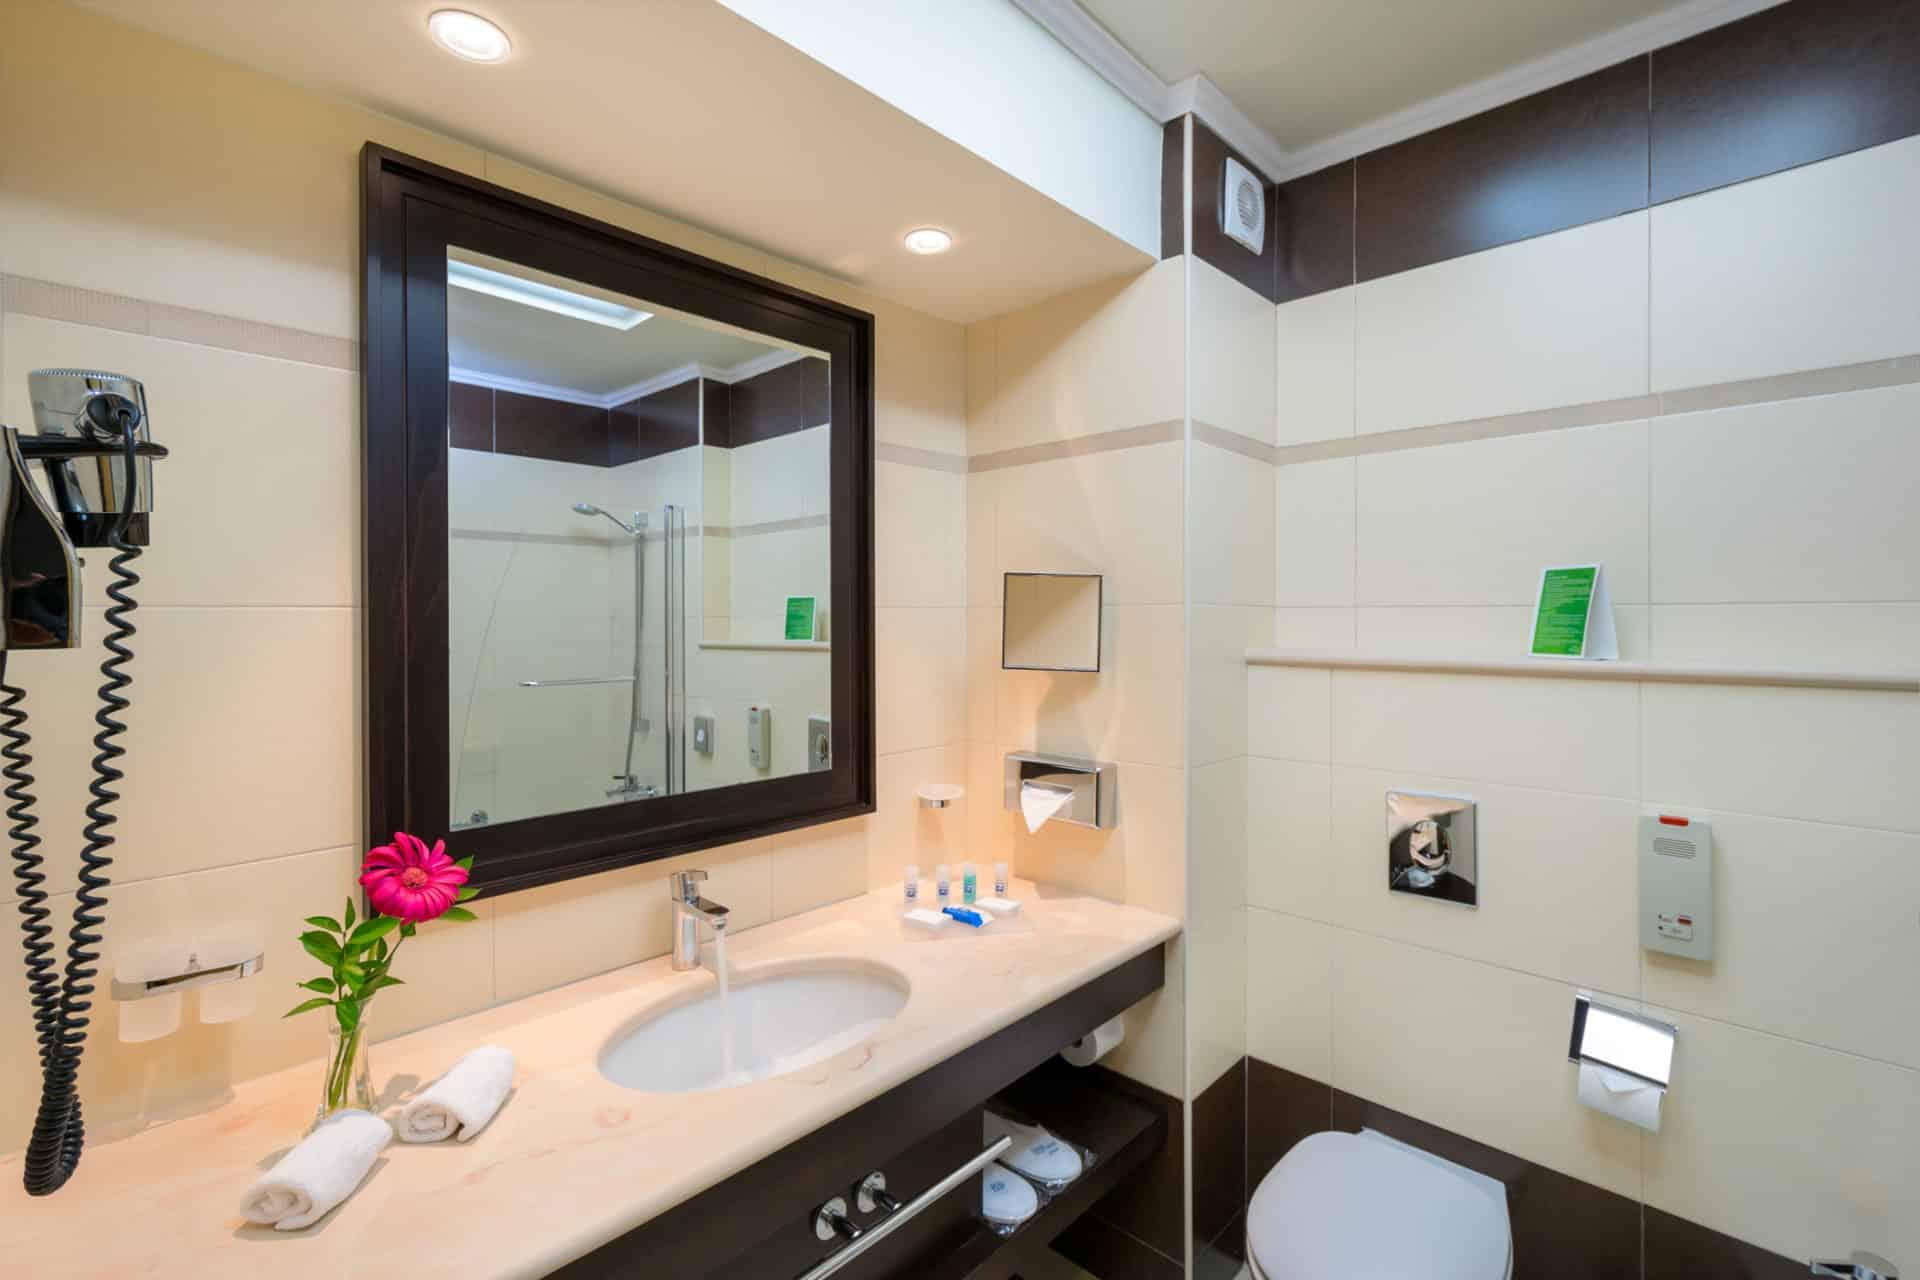 130_Bathroom_Deluxe_Guestroom_ELYSIUM